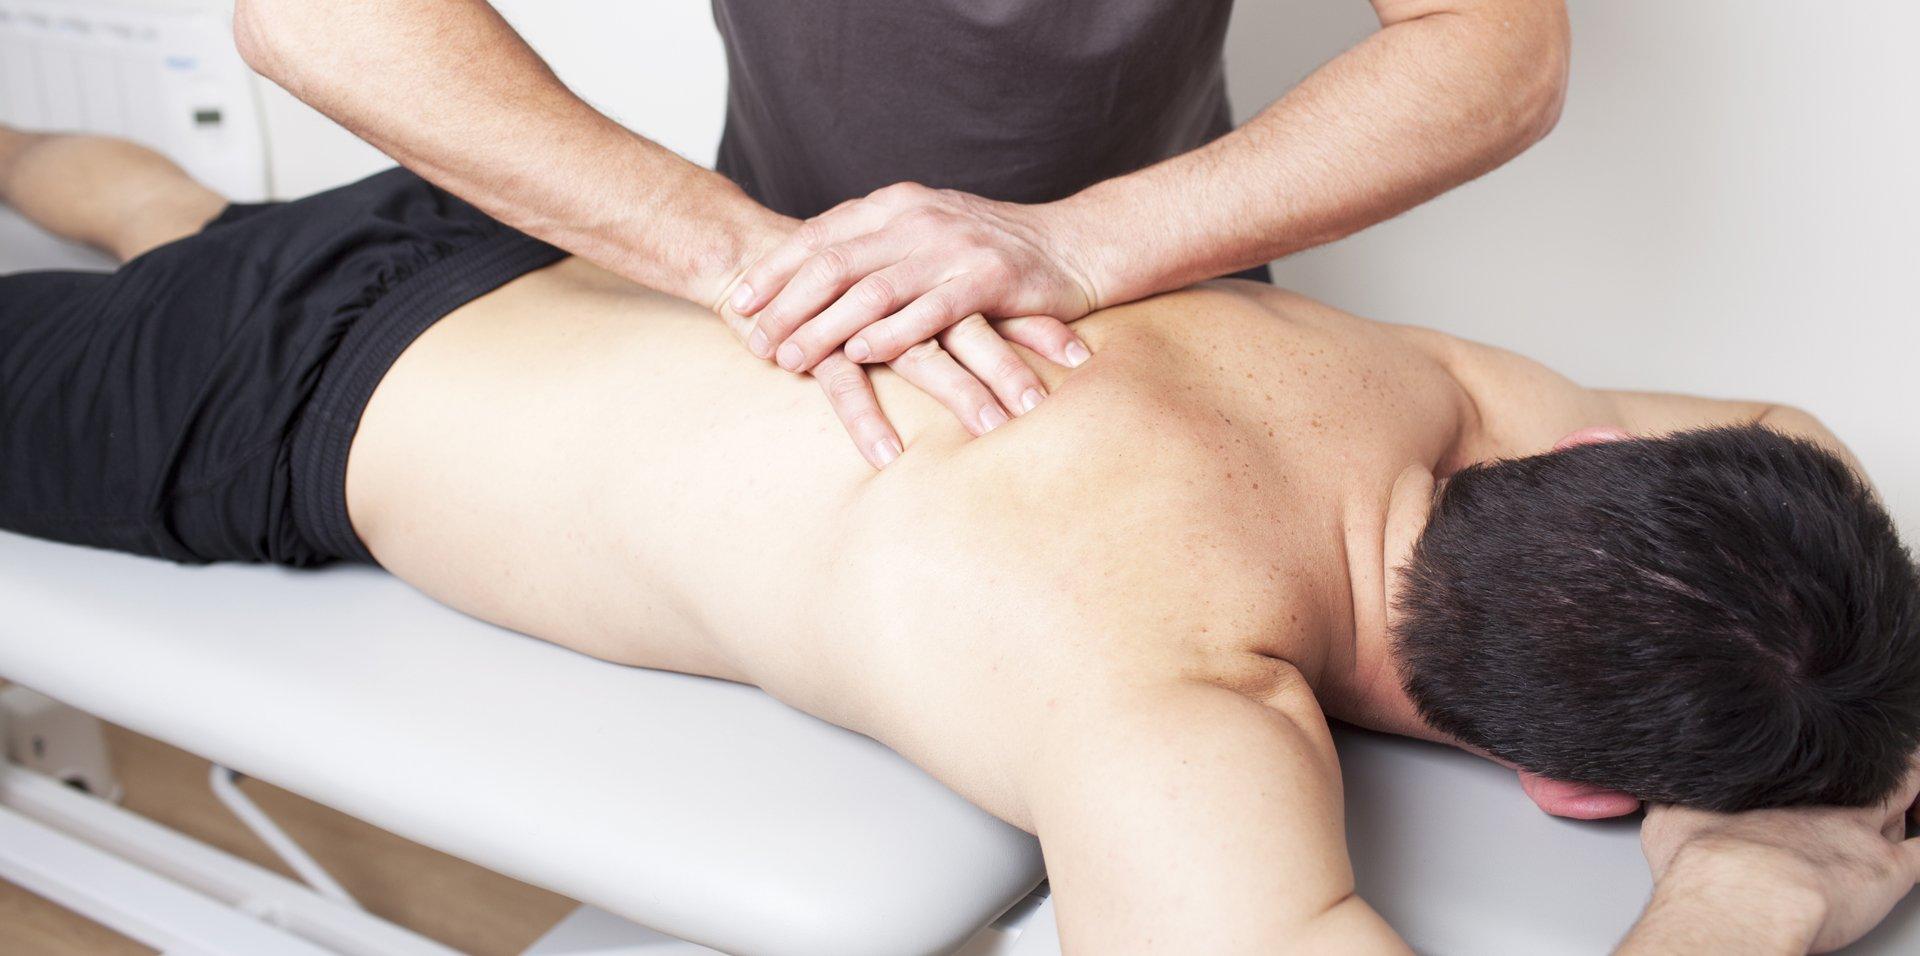 man getting a massage done